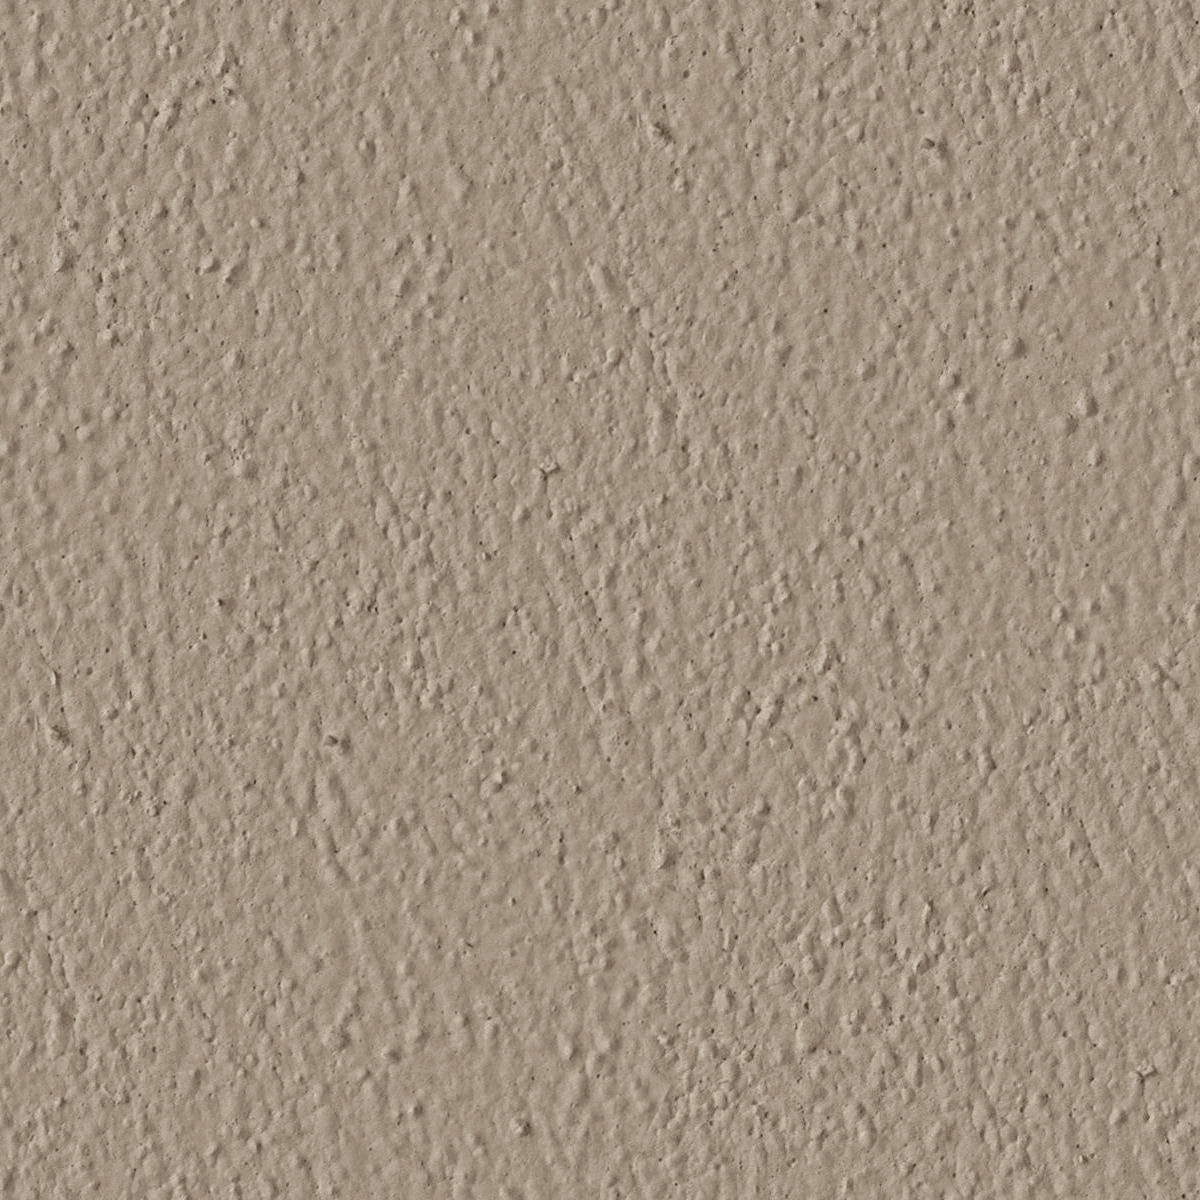 Wall paint texture seamless - High Resolution Seamless Textures Tileable Stucco Wall Texture 15